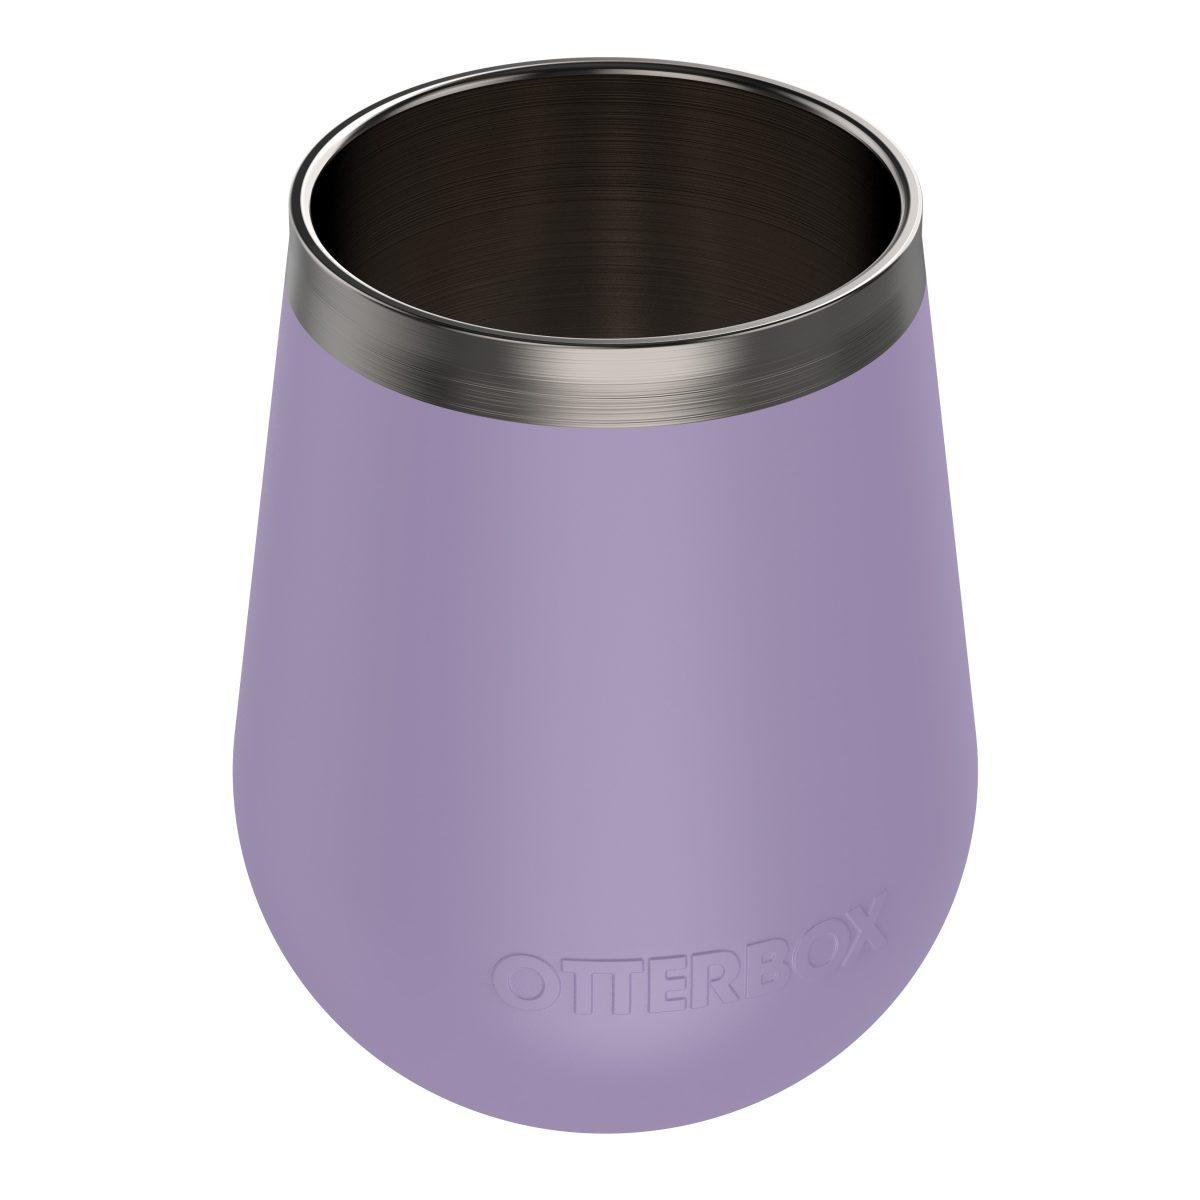 otterbox wine lavender 02